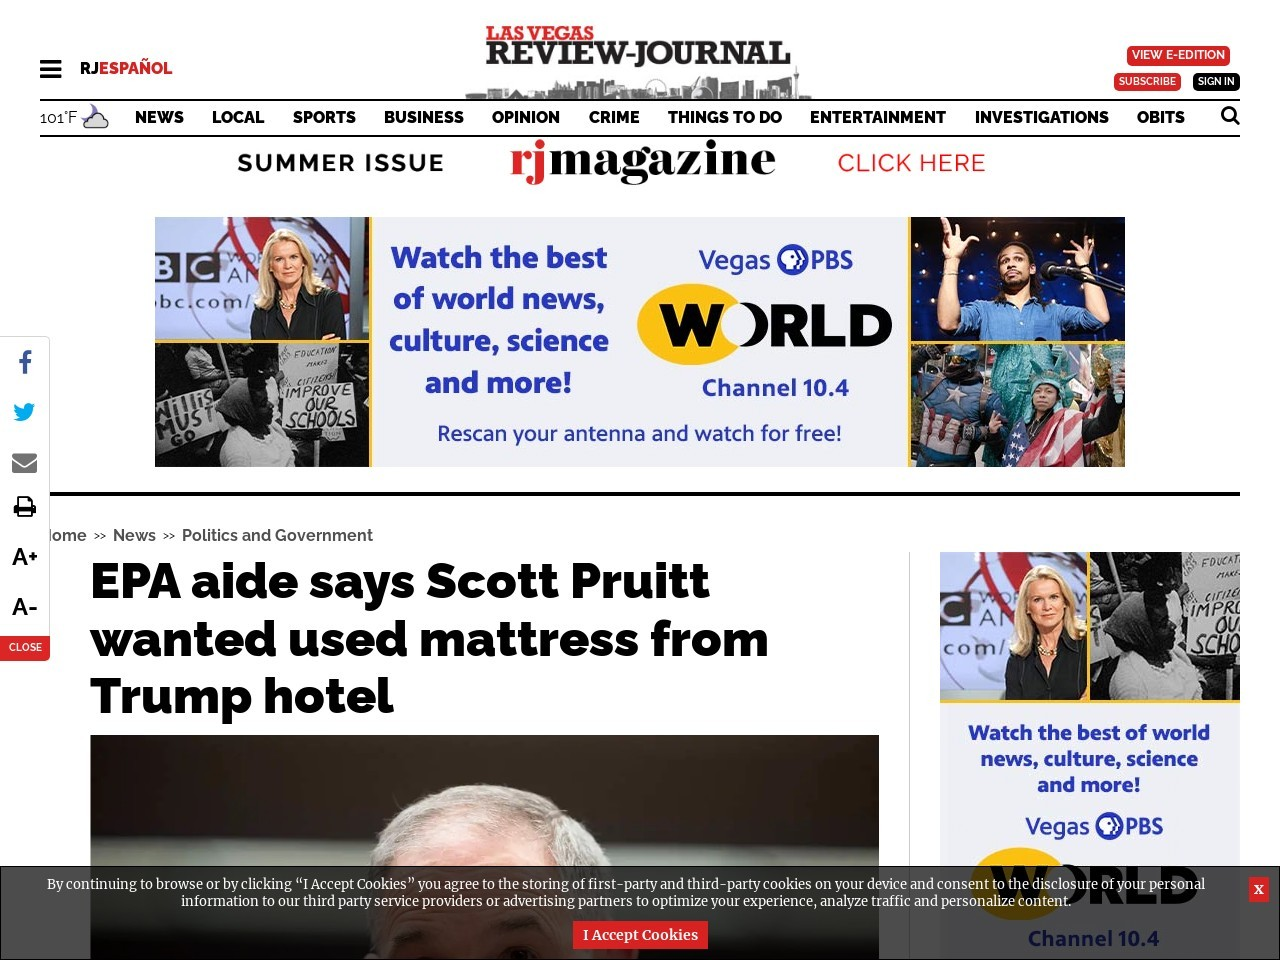 EPA aide says Scott Pruitt wanted used mattress from Trump hotel